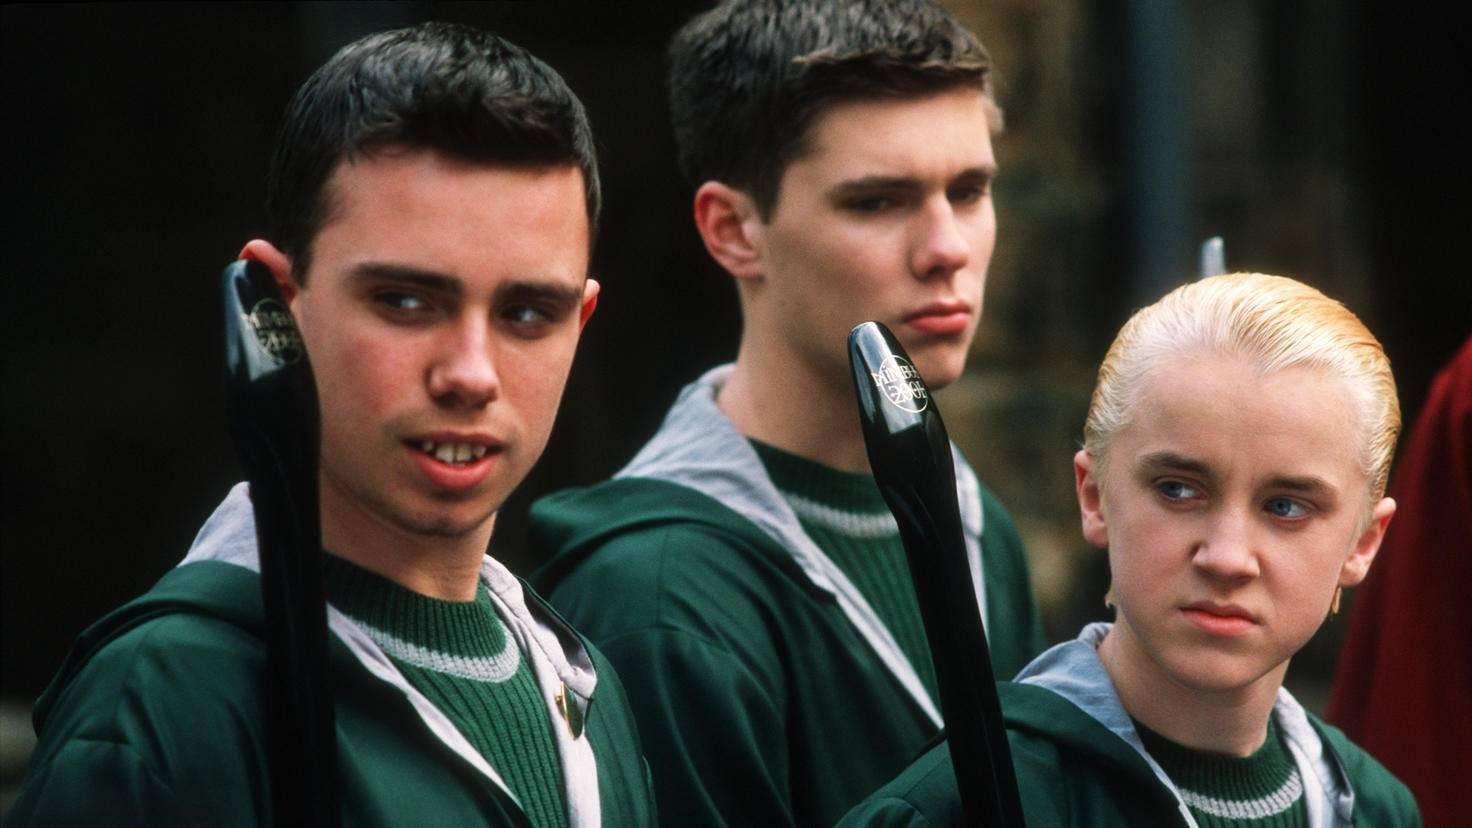 Harry Potter Tom Felton Draco Malfoy